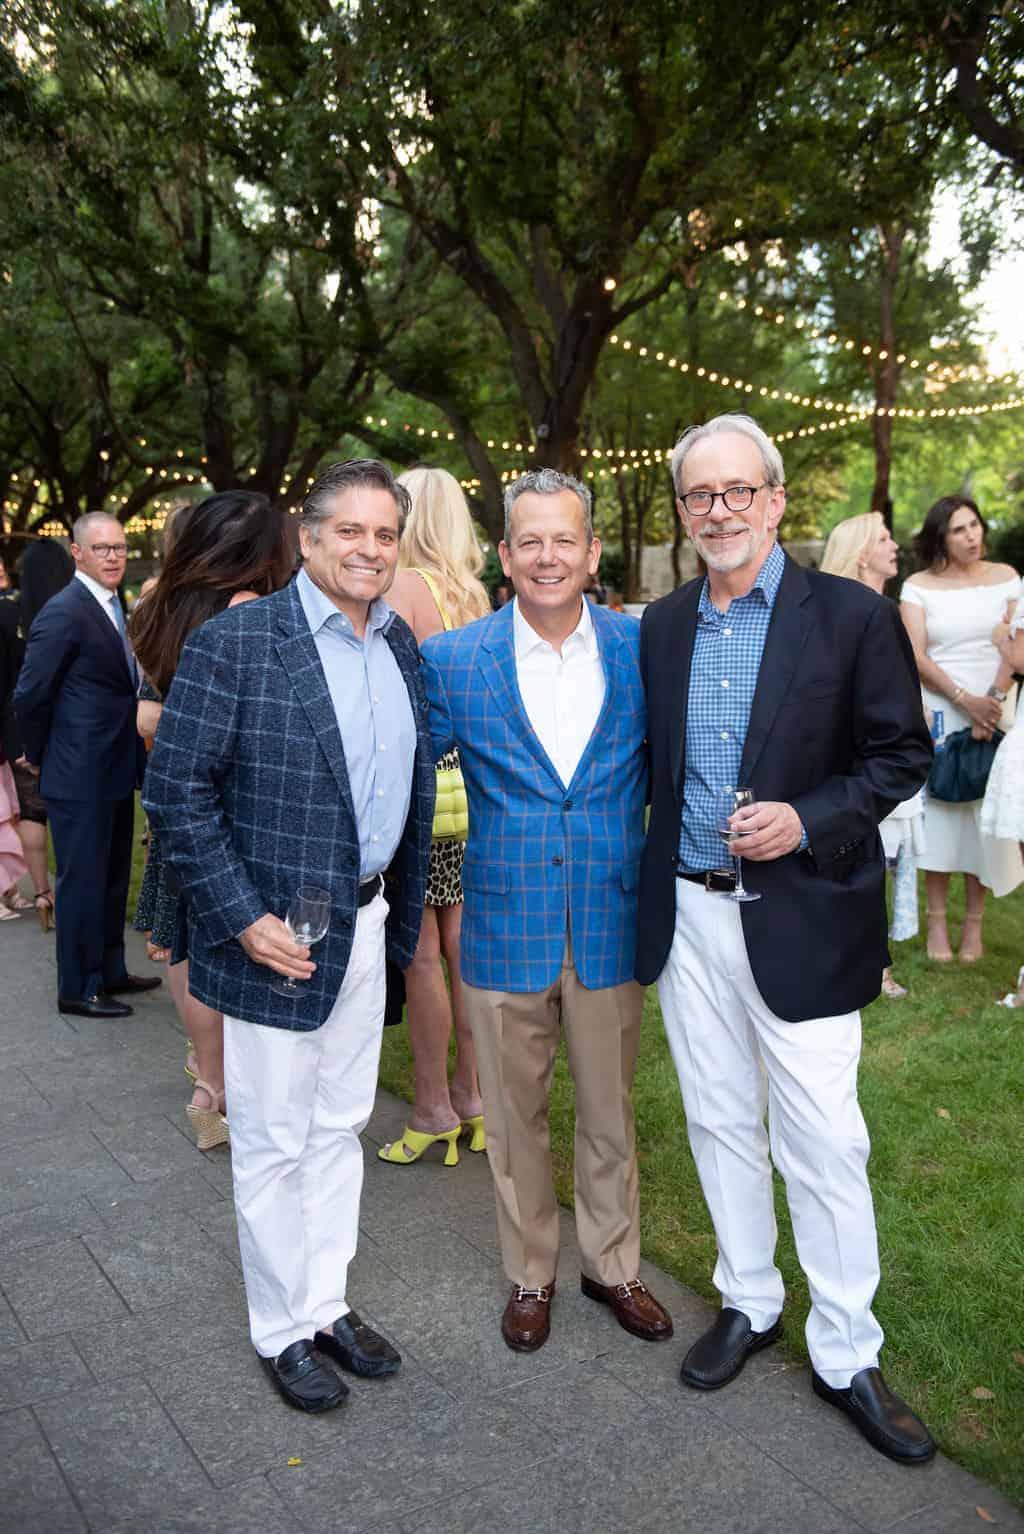 Ron Hoyl, Richard Dix and Mitch Bell